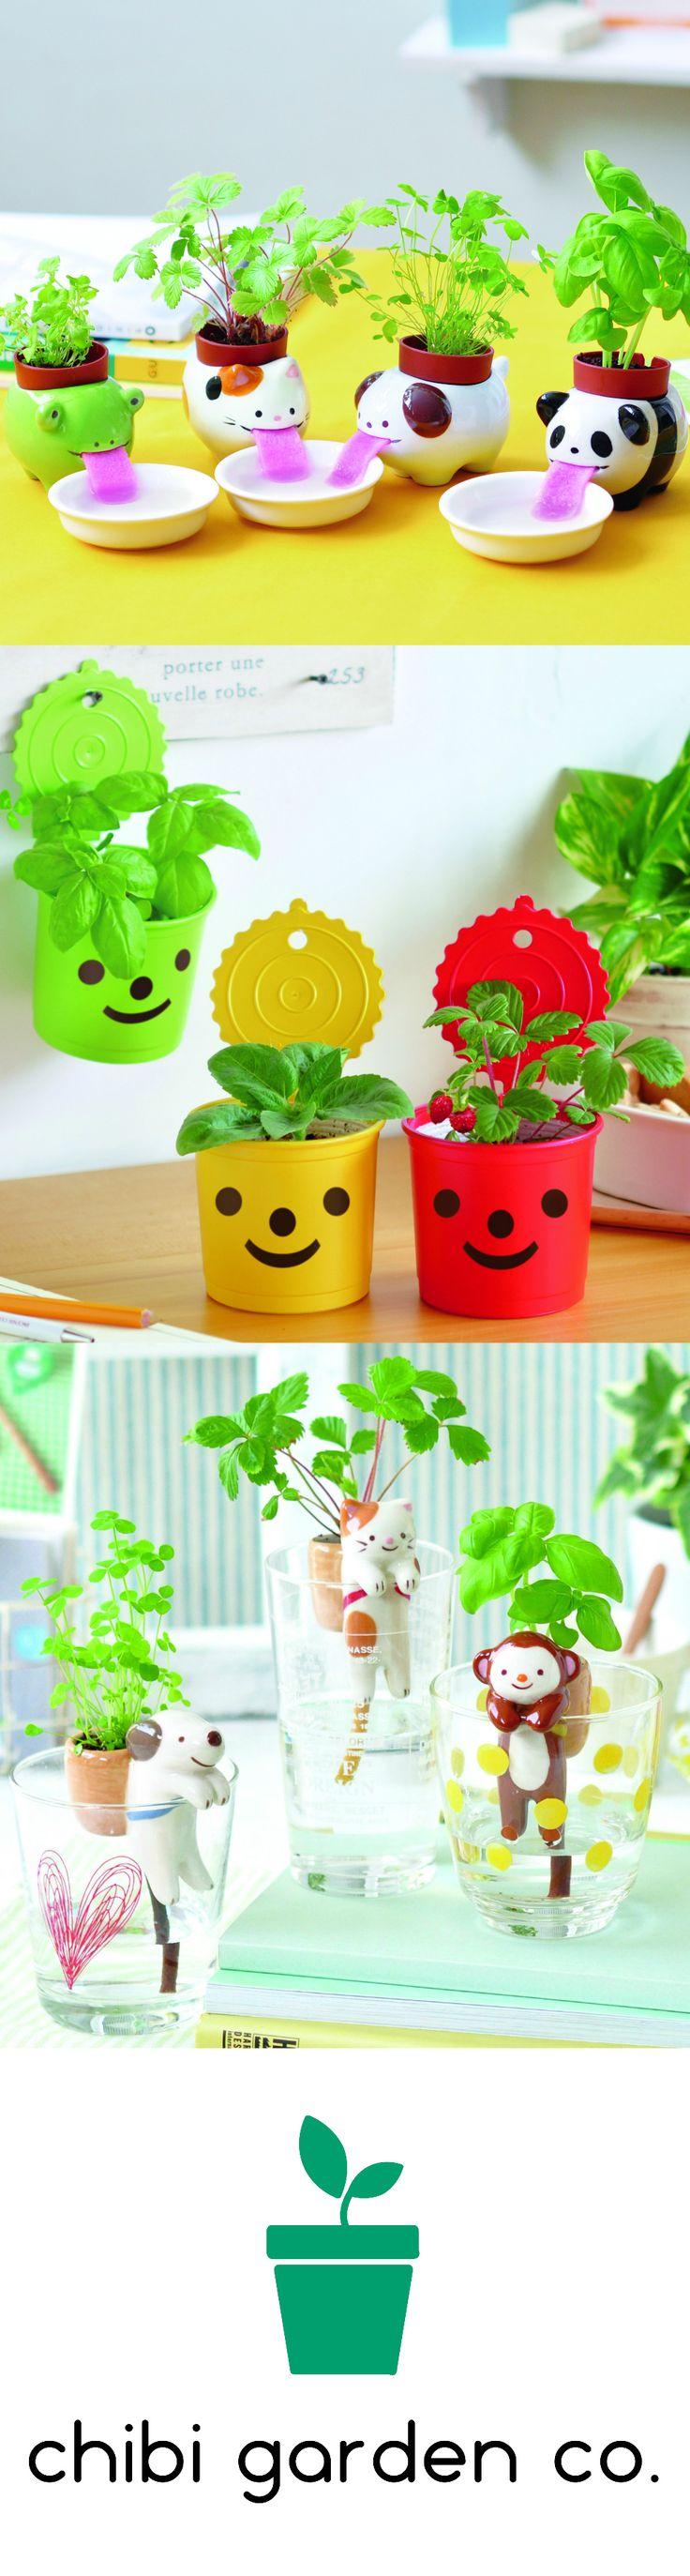 29 best chibi garden co shop images on pinterest chibi shop at